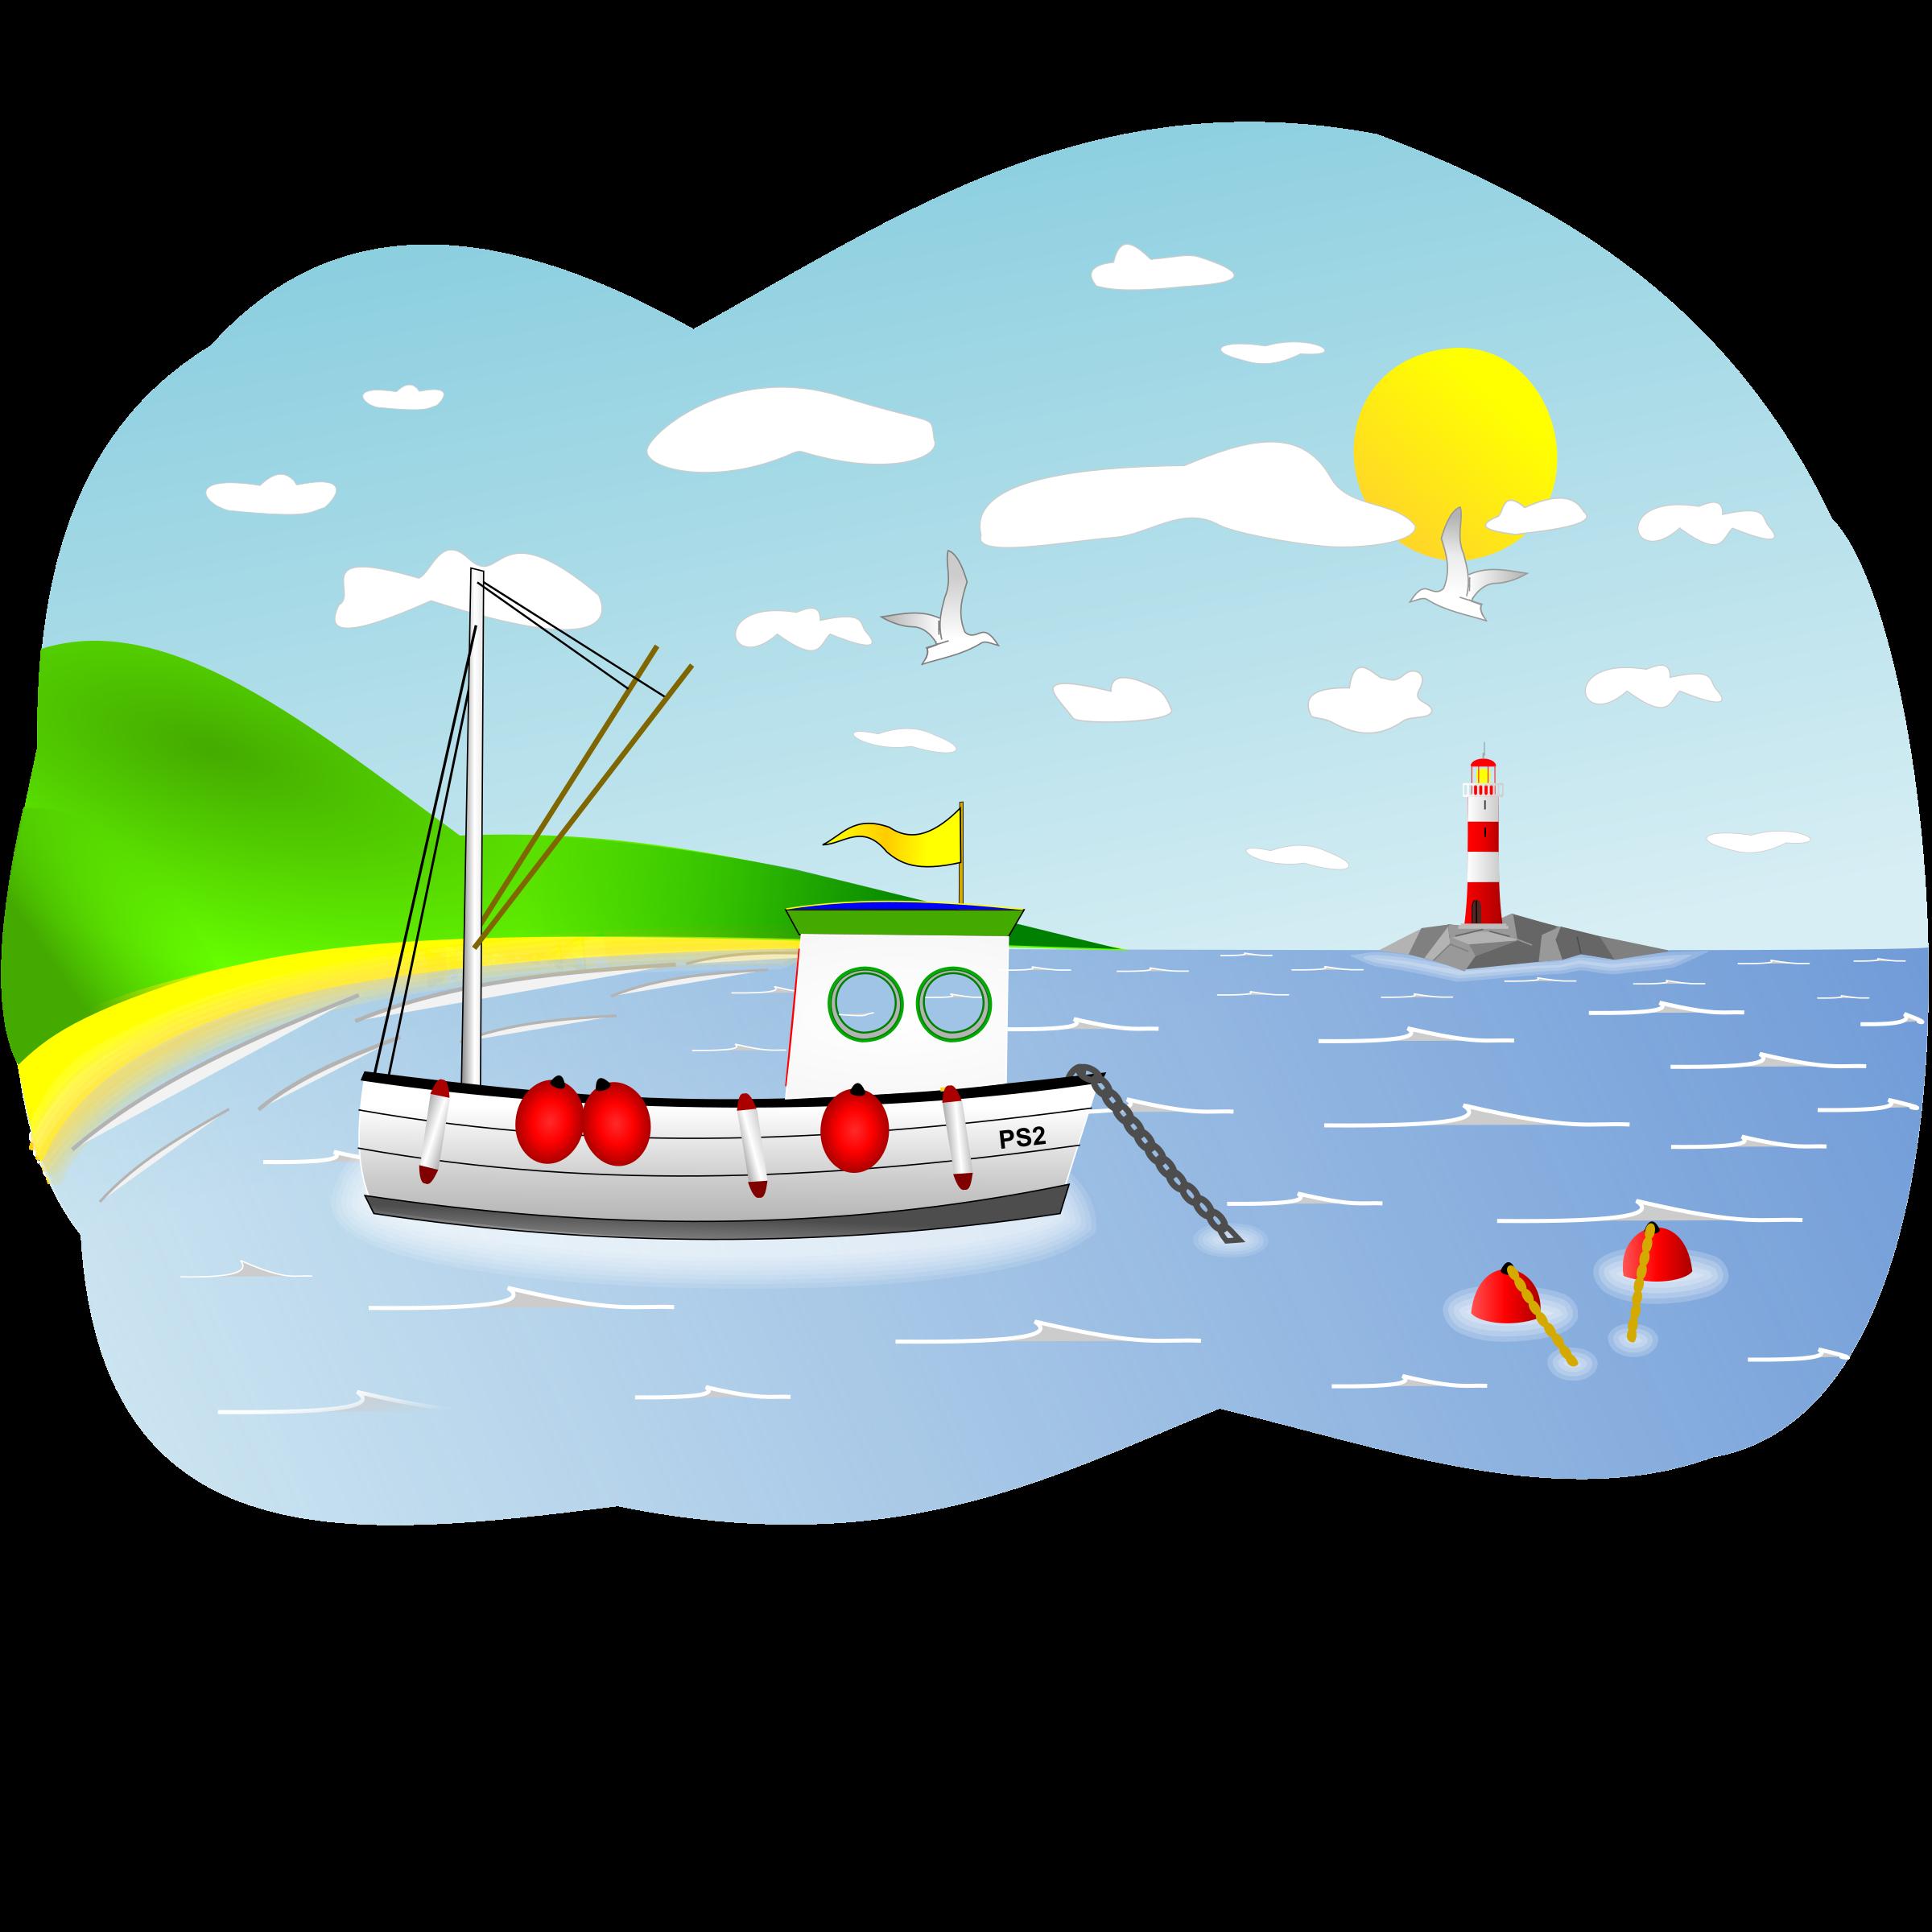 Transportation clipart scene. Coastal fishing boat big